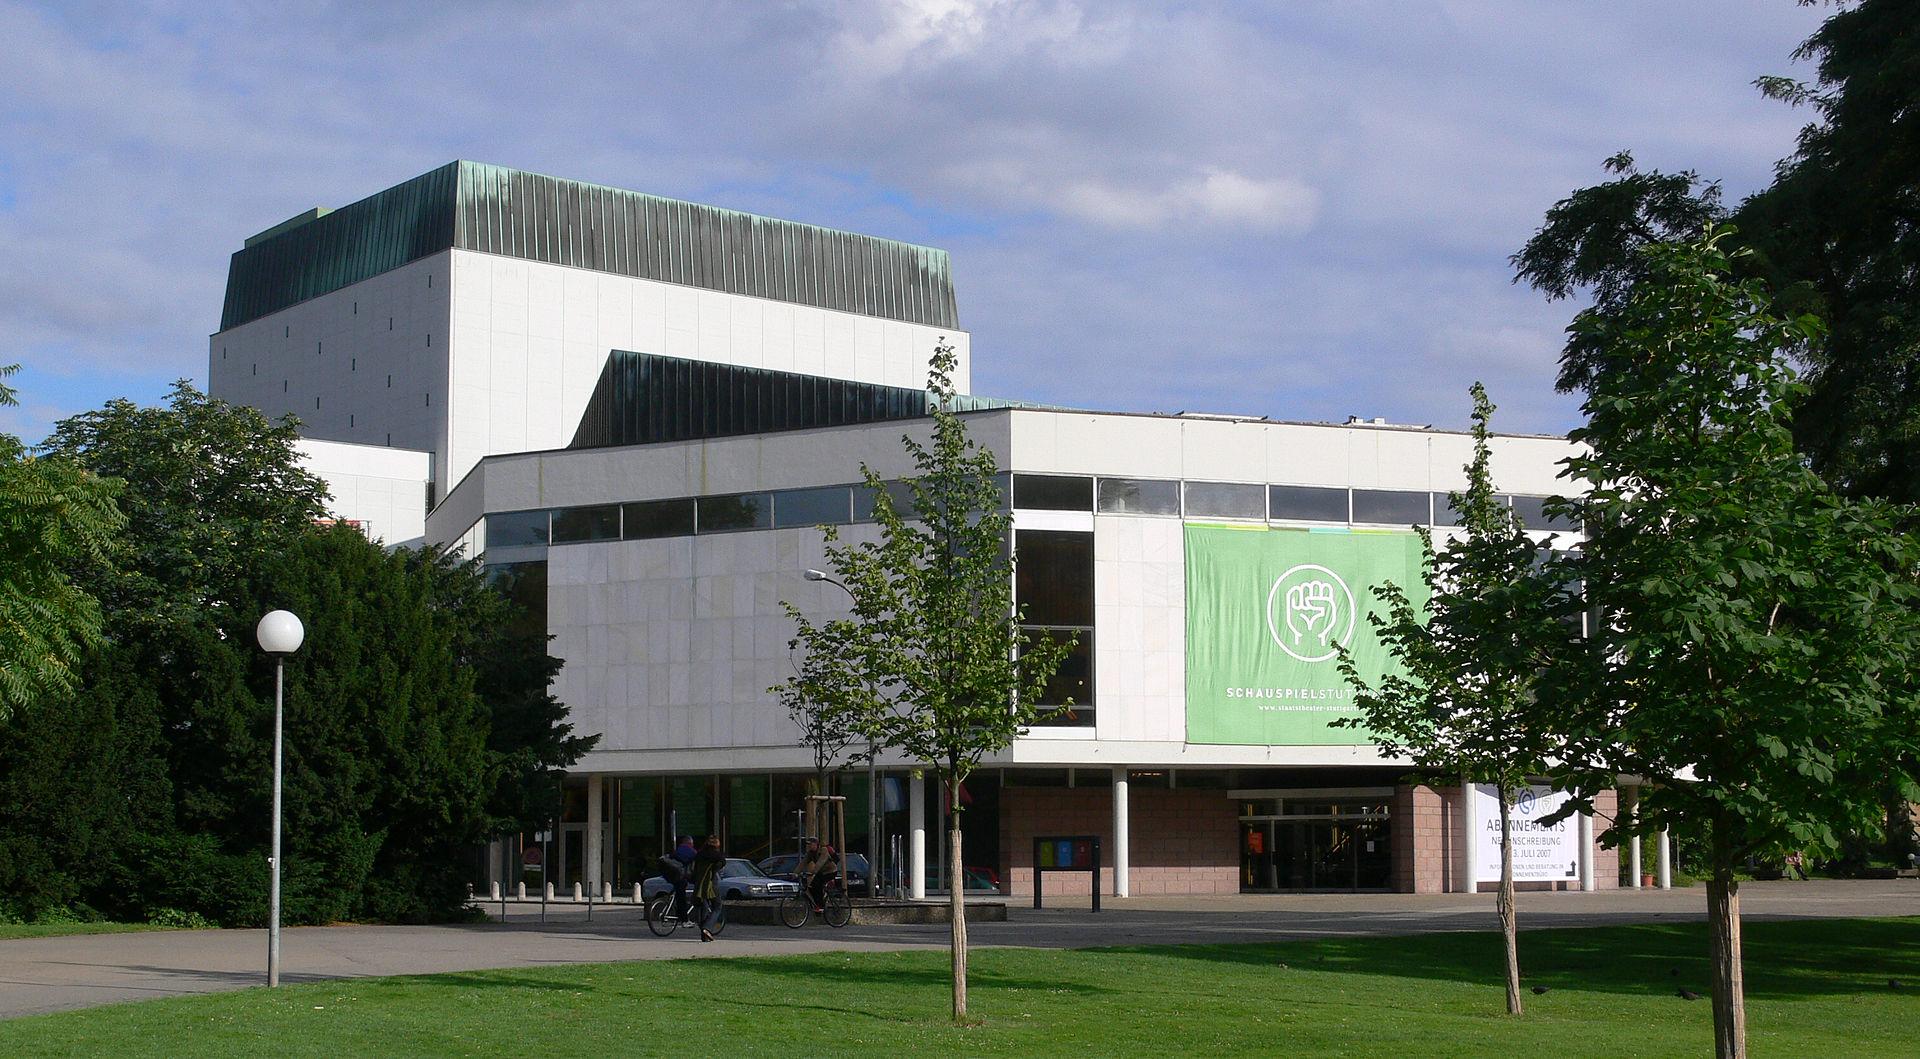 Bild Schauspielhaus Stuttgart